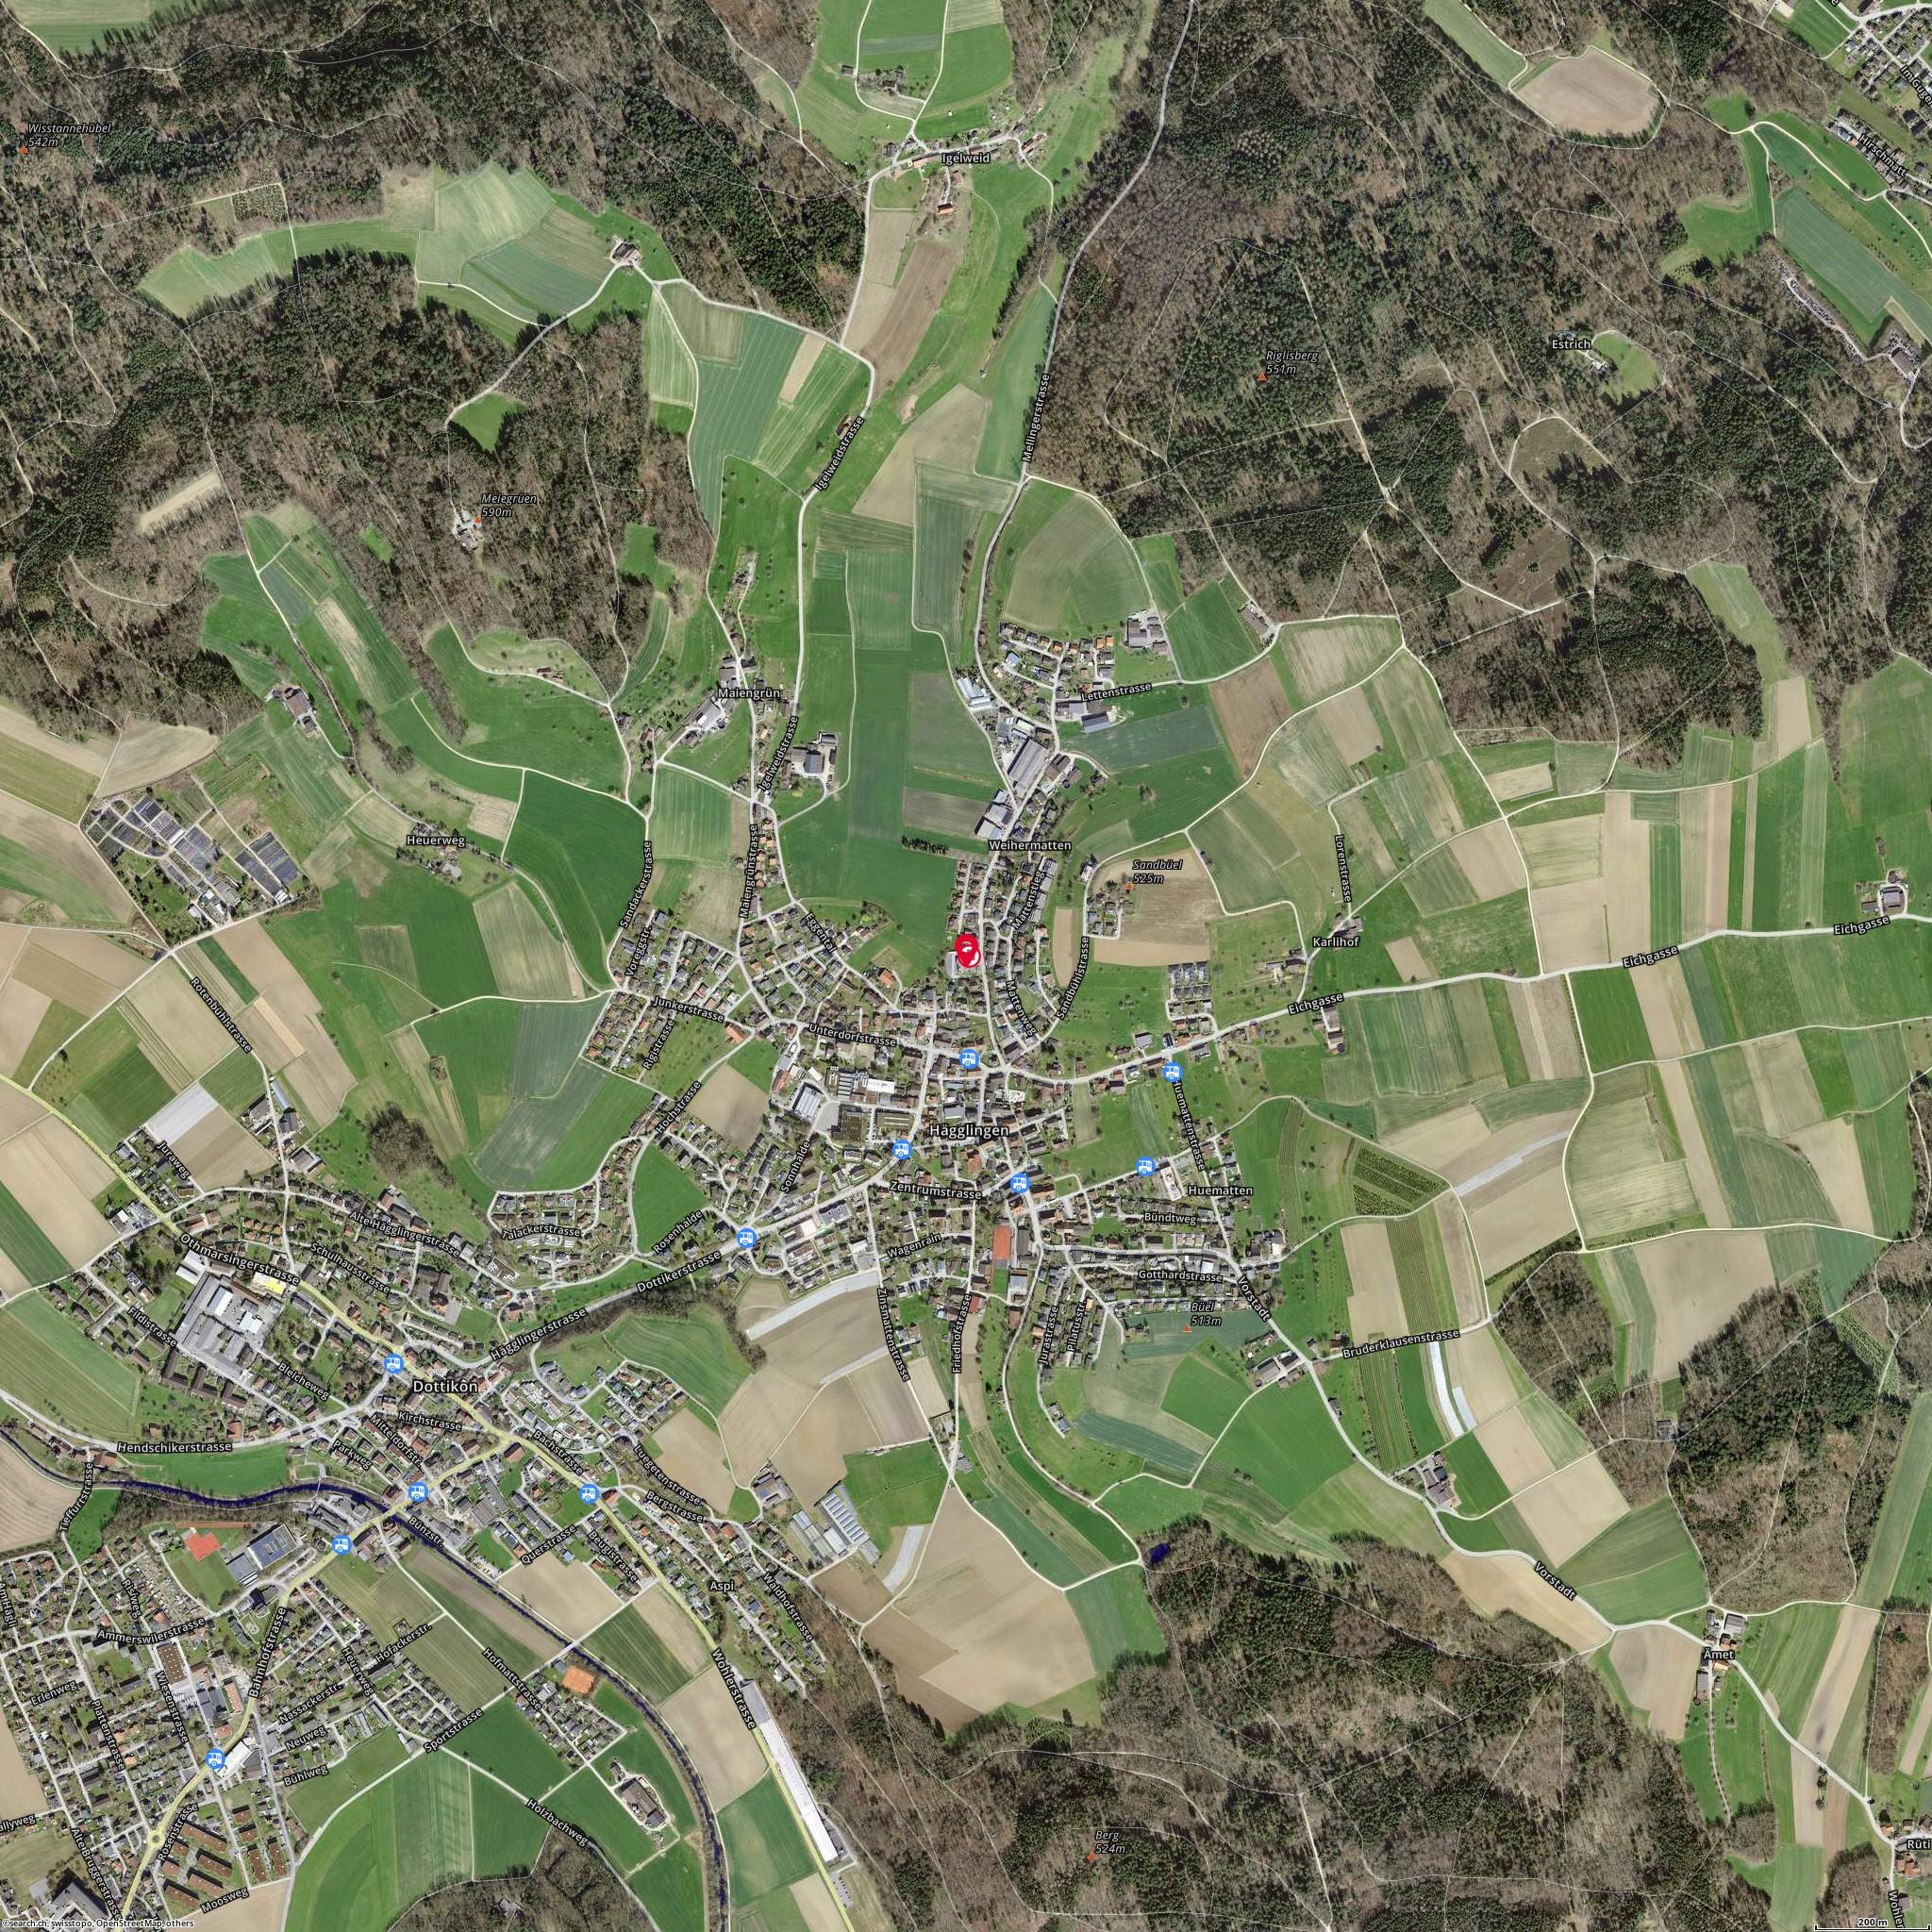 Karte: Geissmann Bus AG, Hägglingen, Mellingerstr. 9